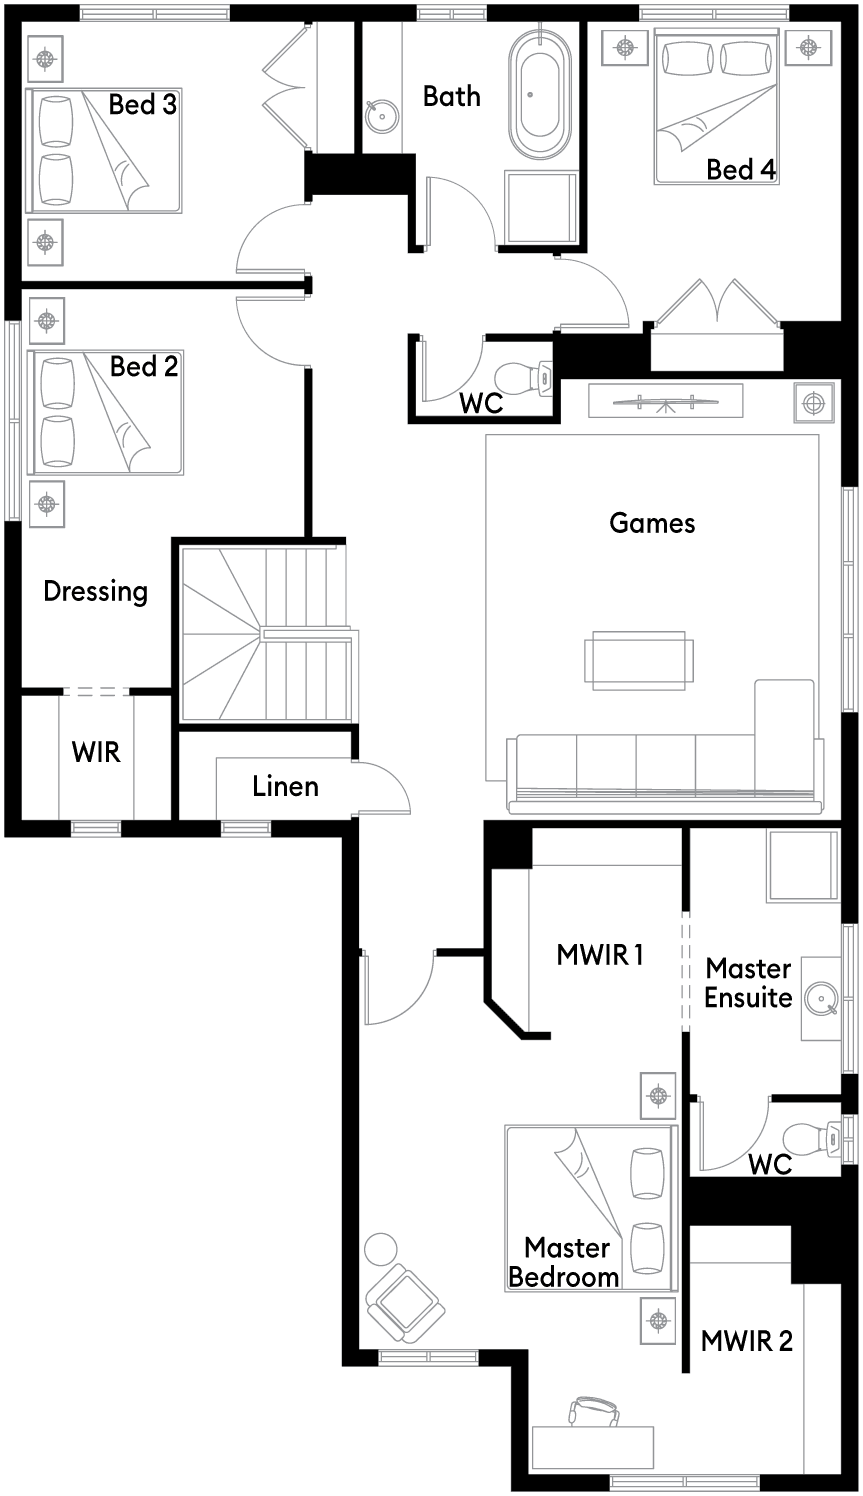 FloorPlan2_HOUSE753_Charlton_36-02-2